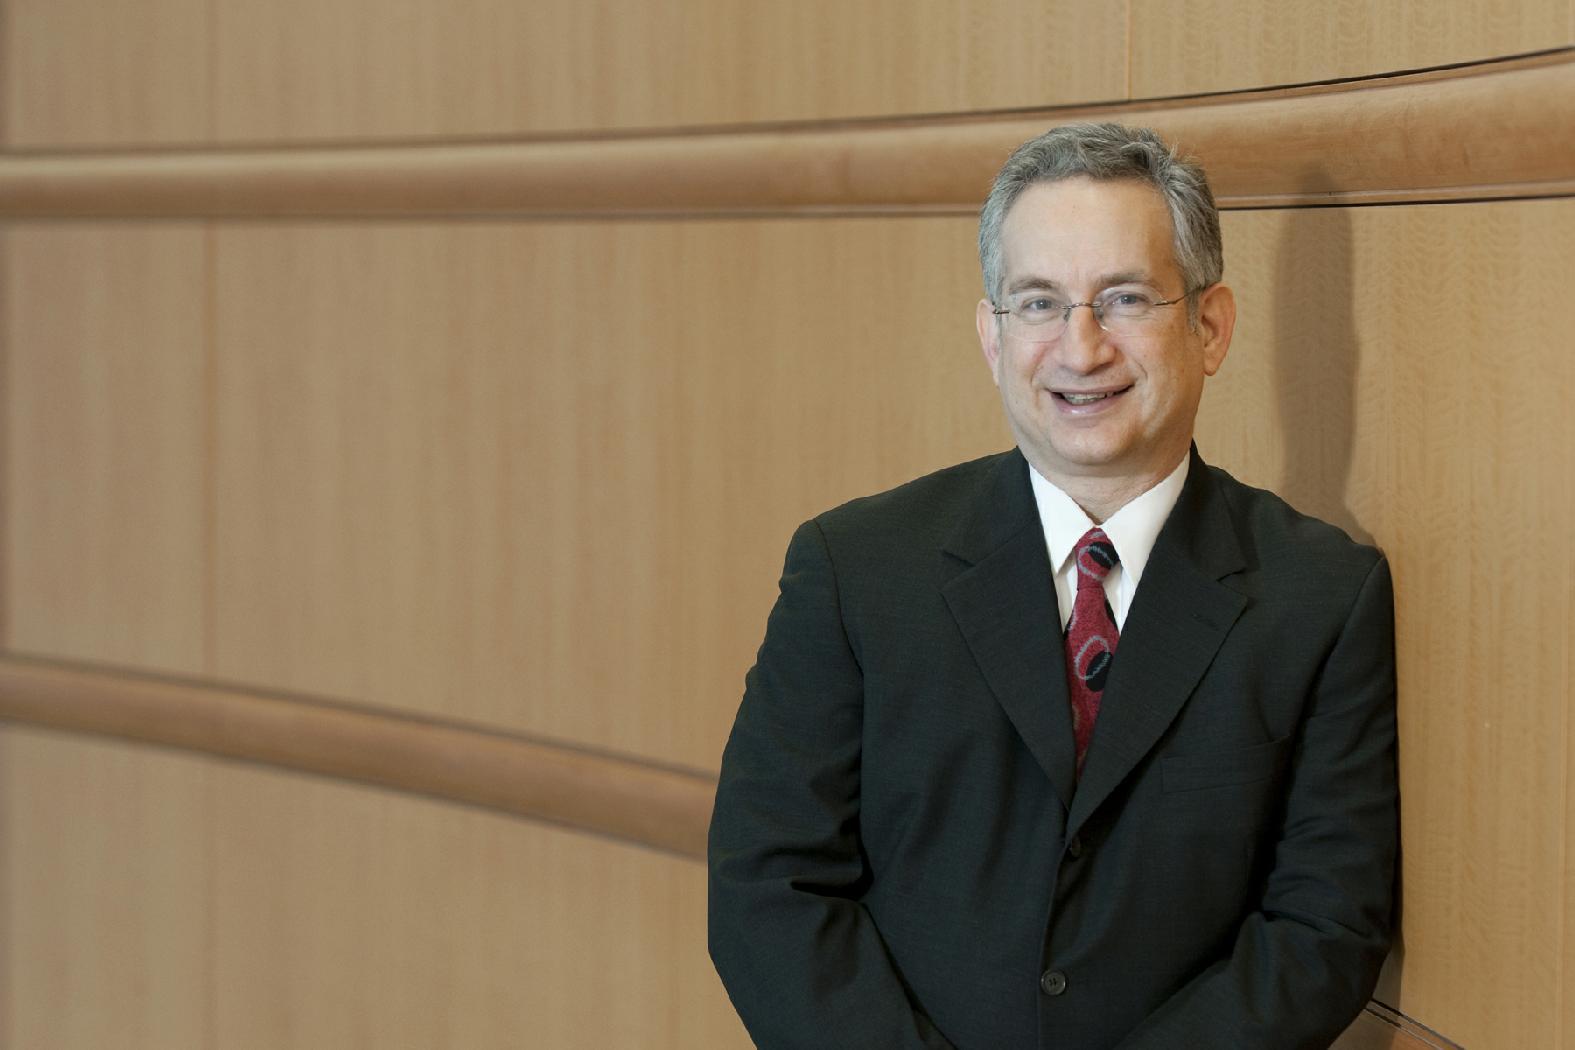 Marc Allan Feldman